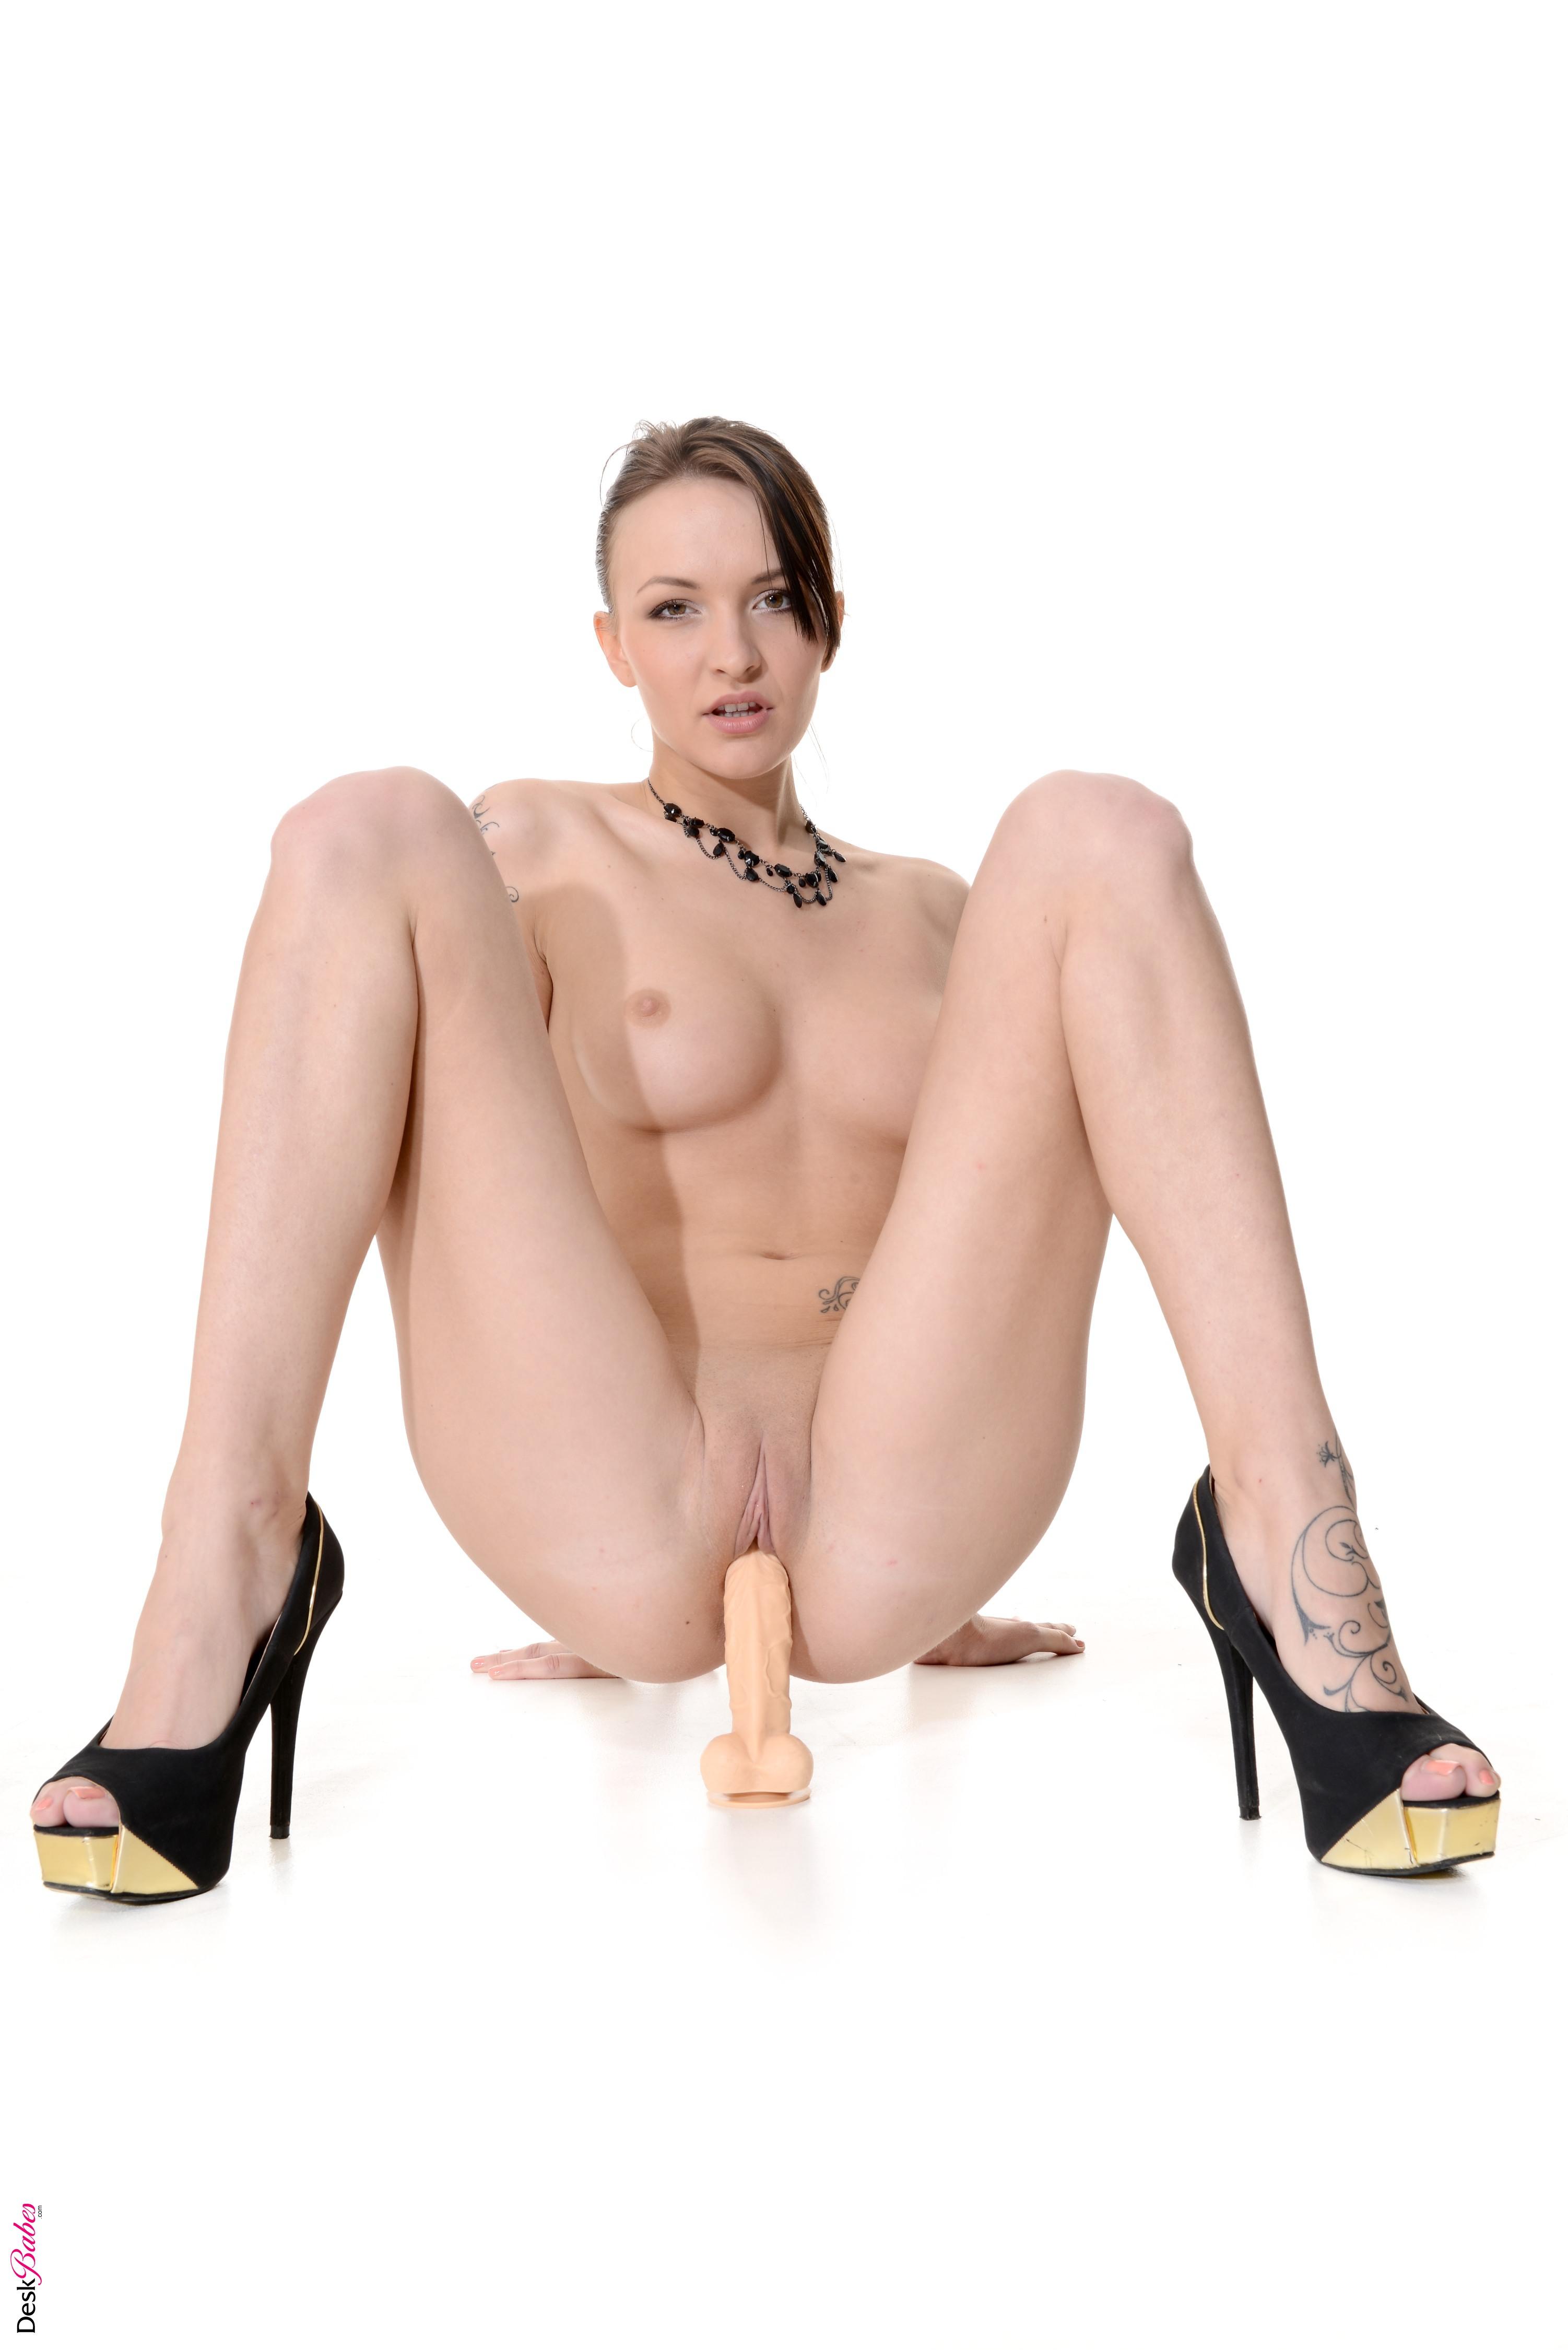 hot sexy nude babes milf woman christmas wallpaper